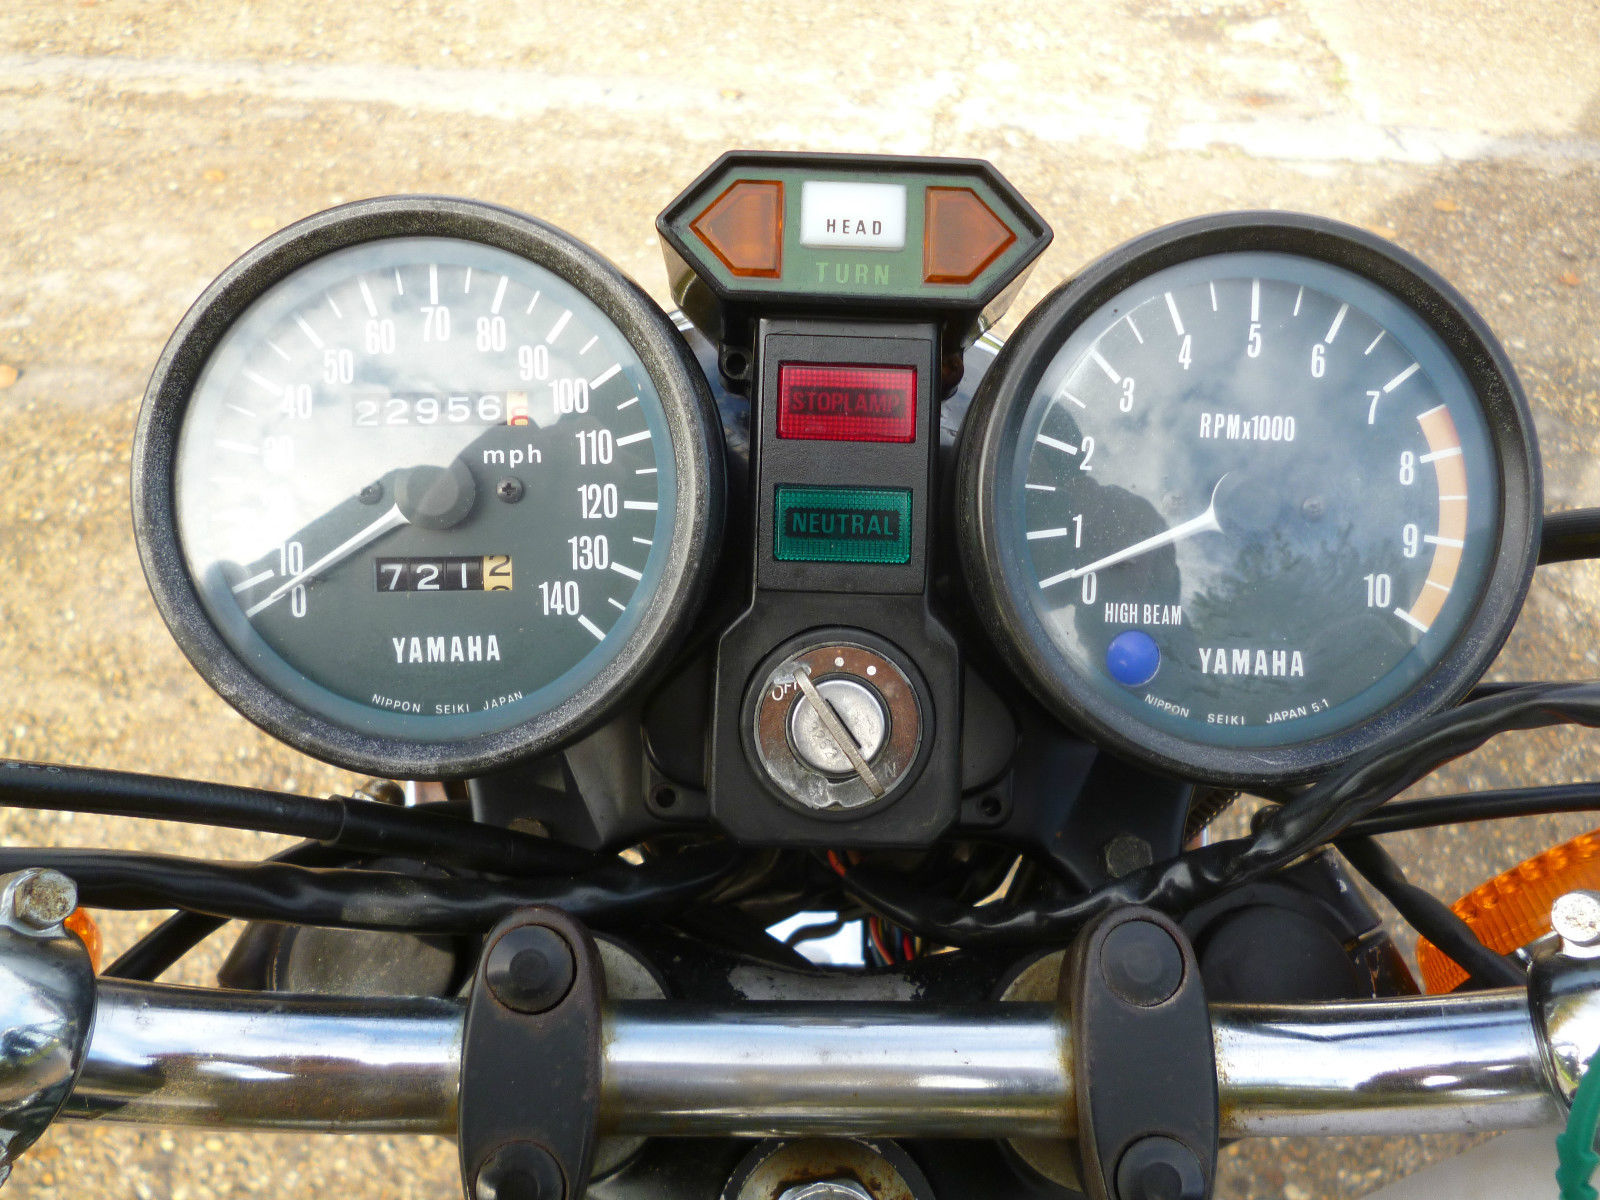 Yamaha Xs650 Classic Restoration Flat Tracker Cafe Racer 1981 Rephased Wiring Diagram